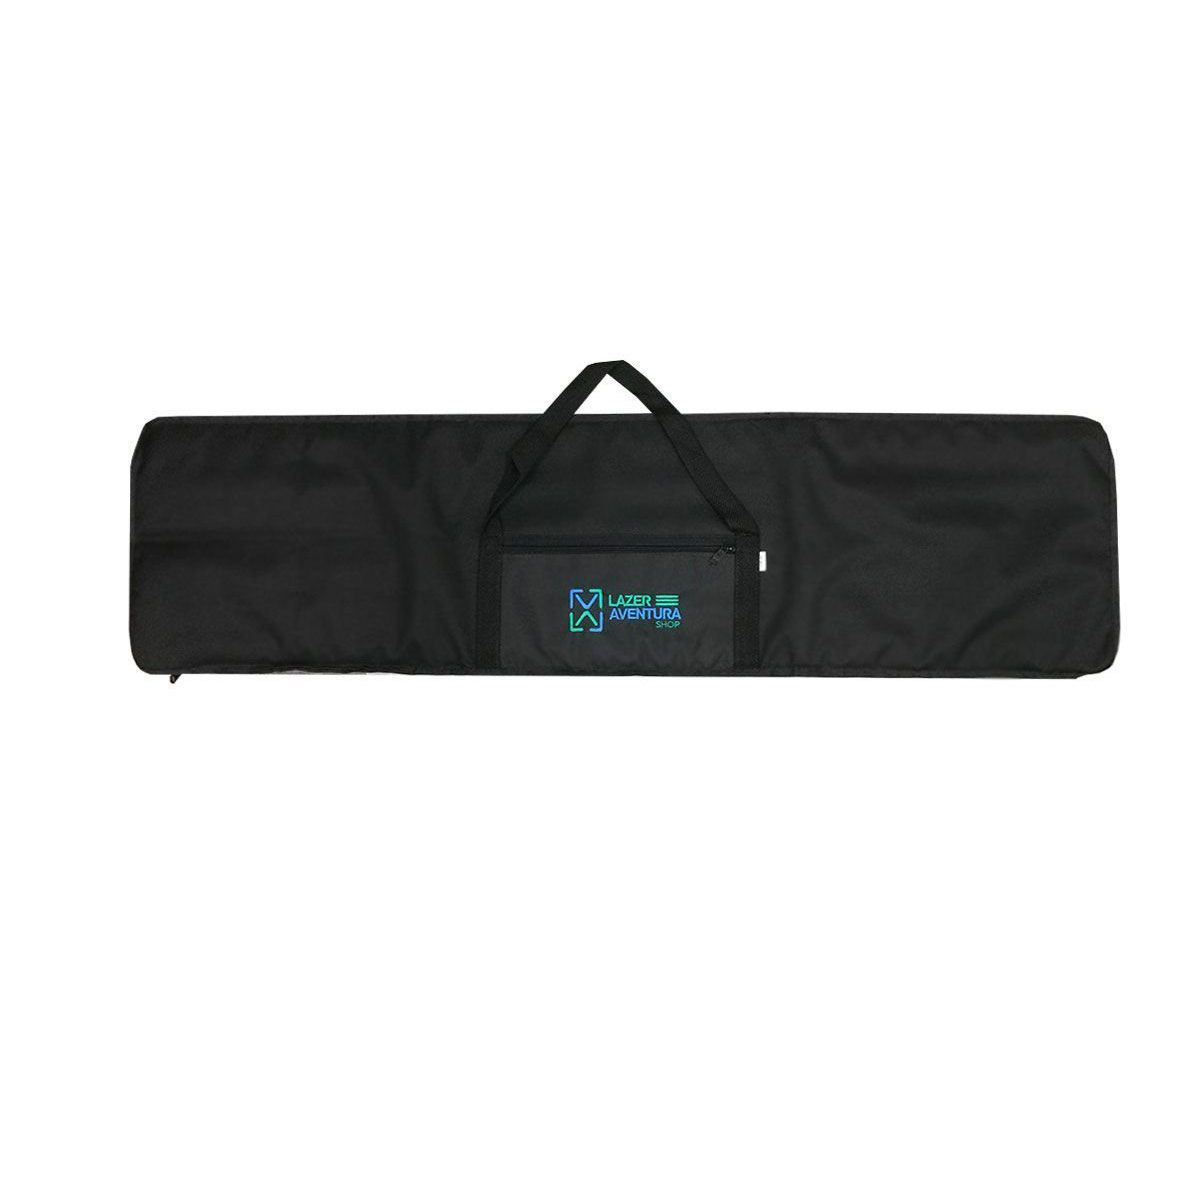 Kit Carabina Rossi HT 80 5,5mm + Capa Lazer e Aventura